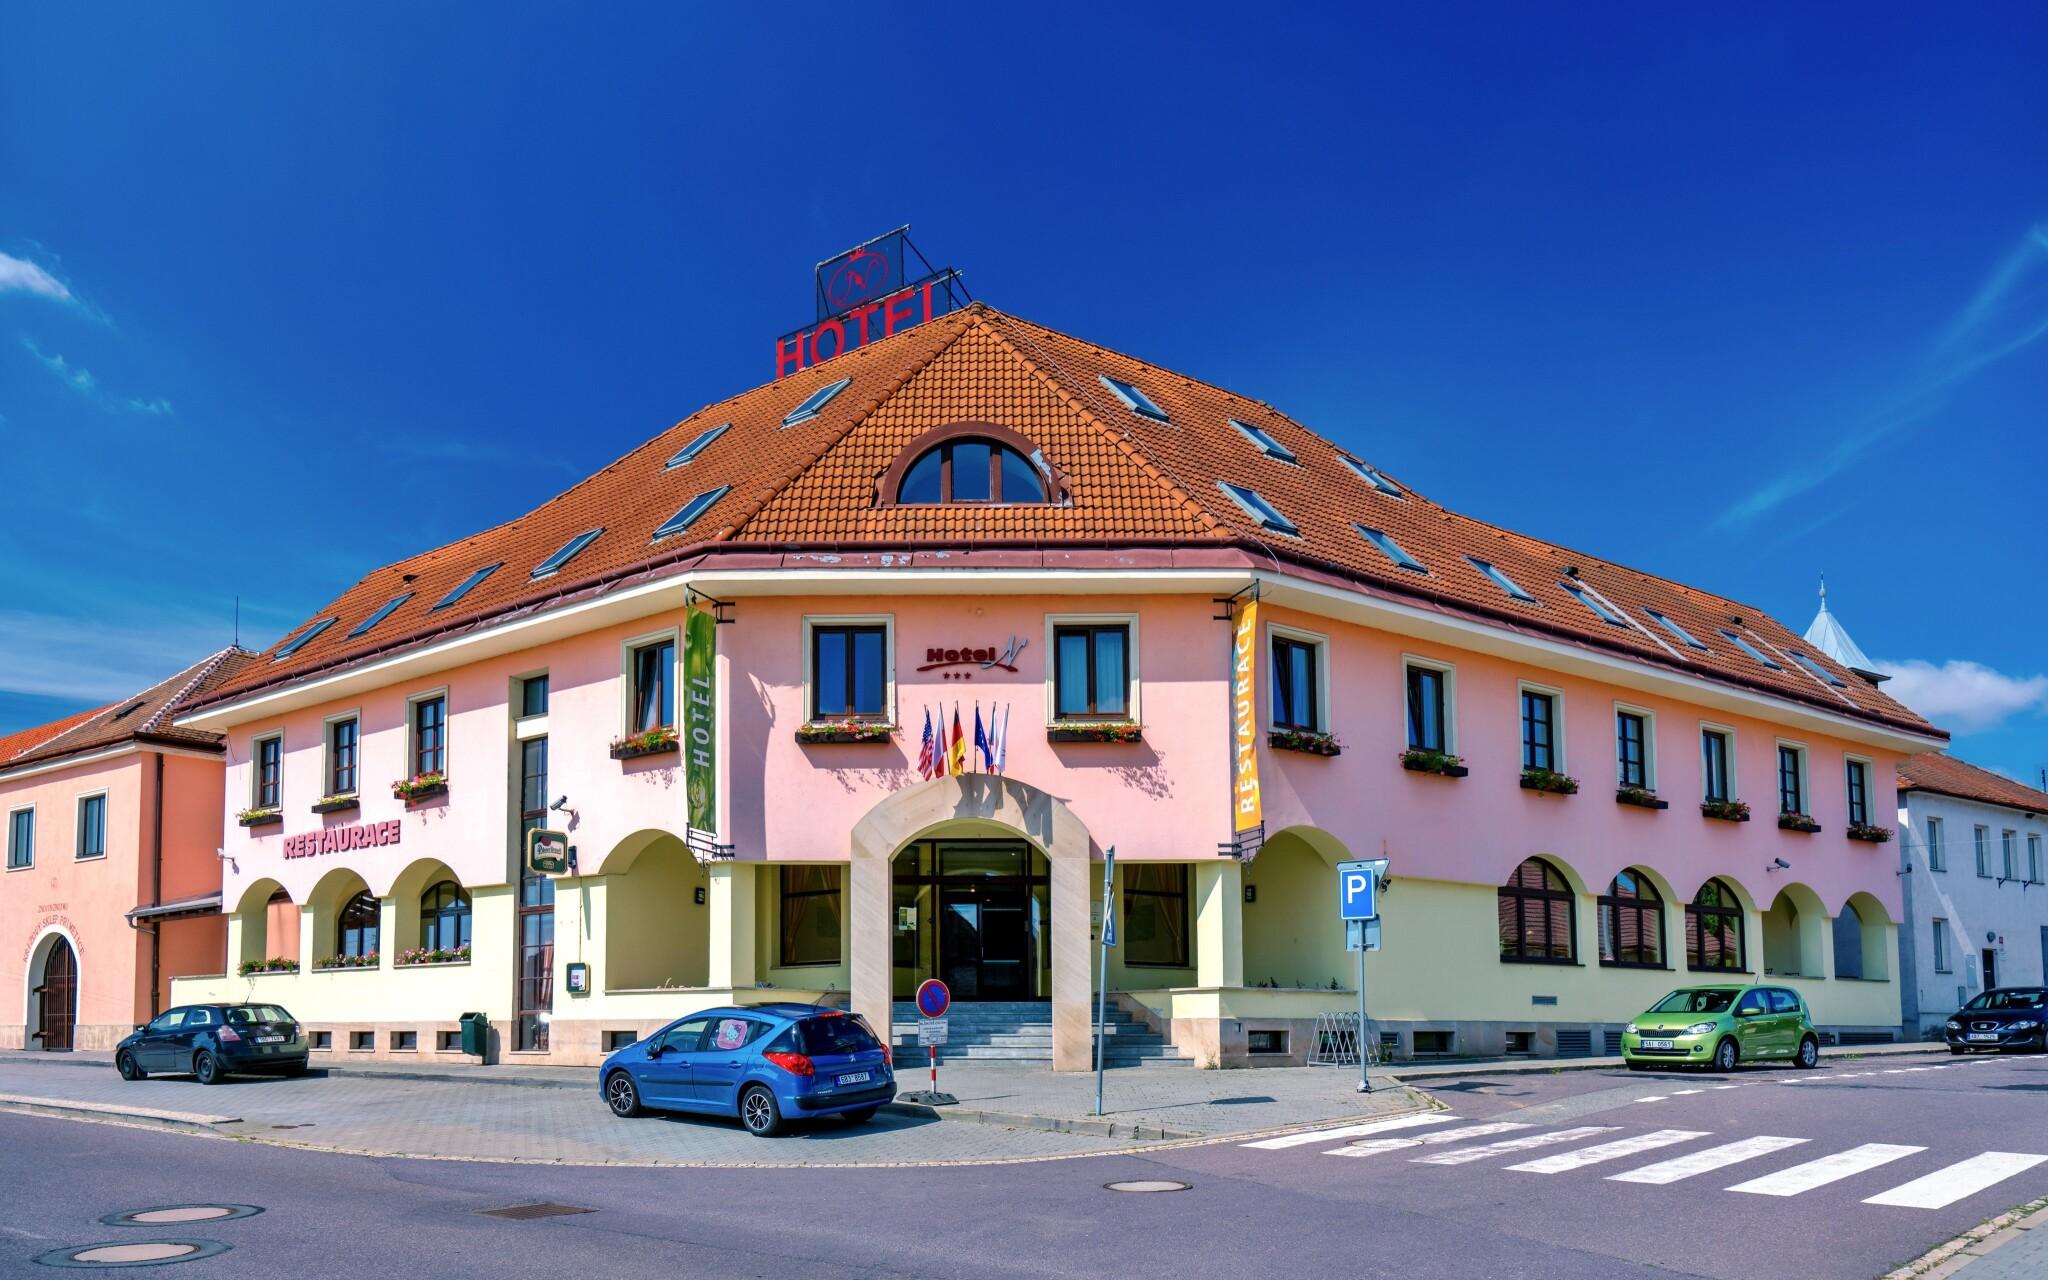 Hotel N *** stojí na okraji Znojma